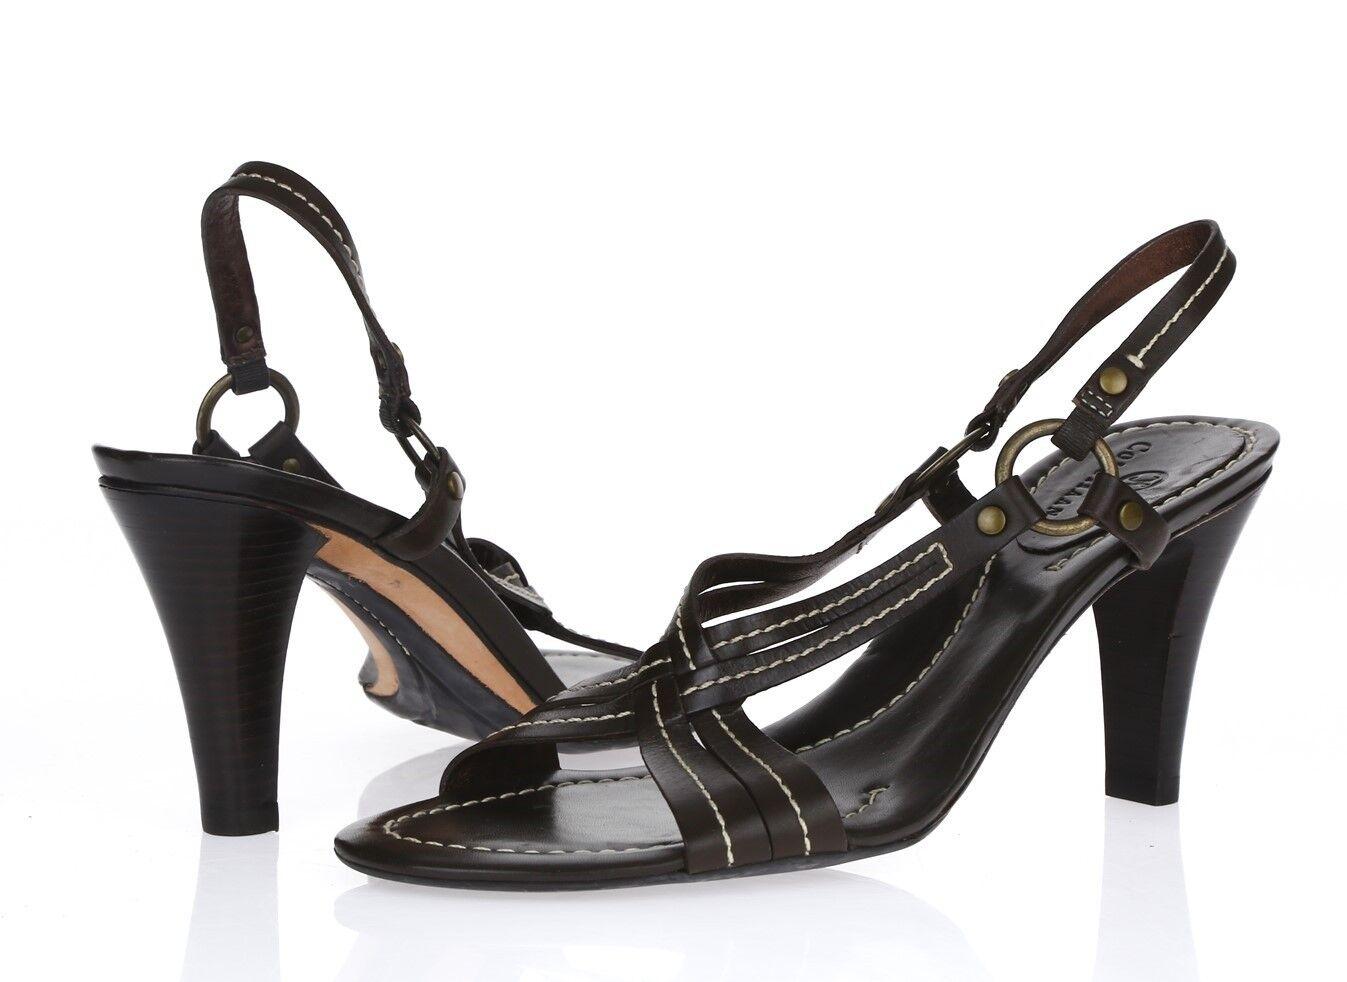 Damenschuhe COLE HAAN 204892 Braun Leder slingback Sandale sz. 8.5 AA